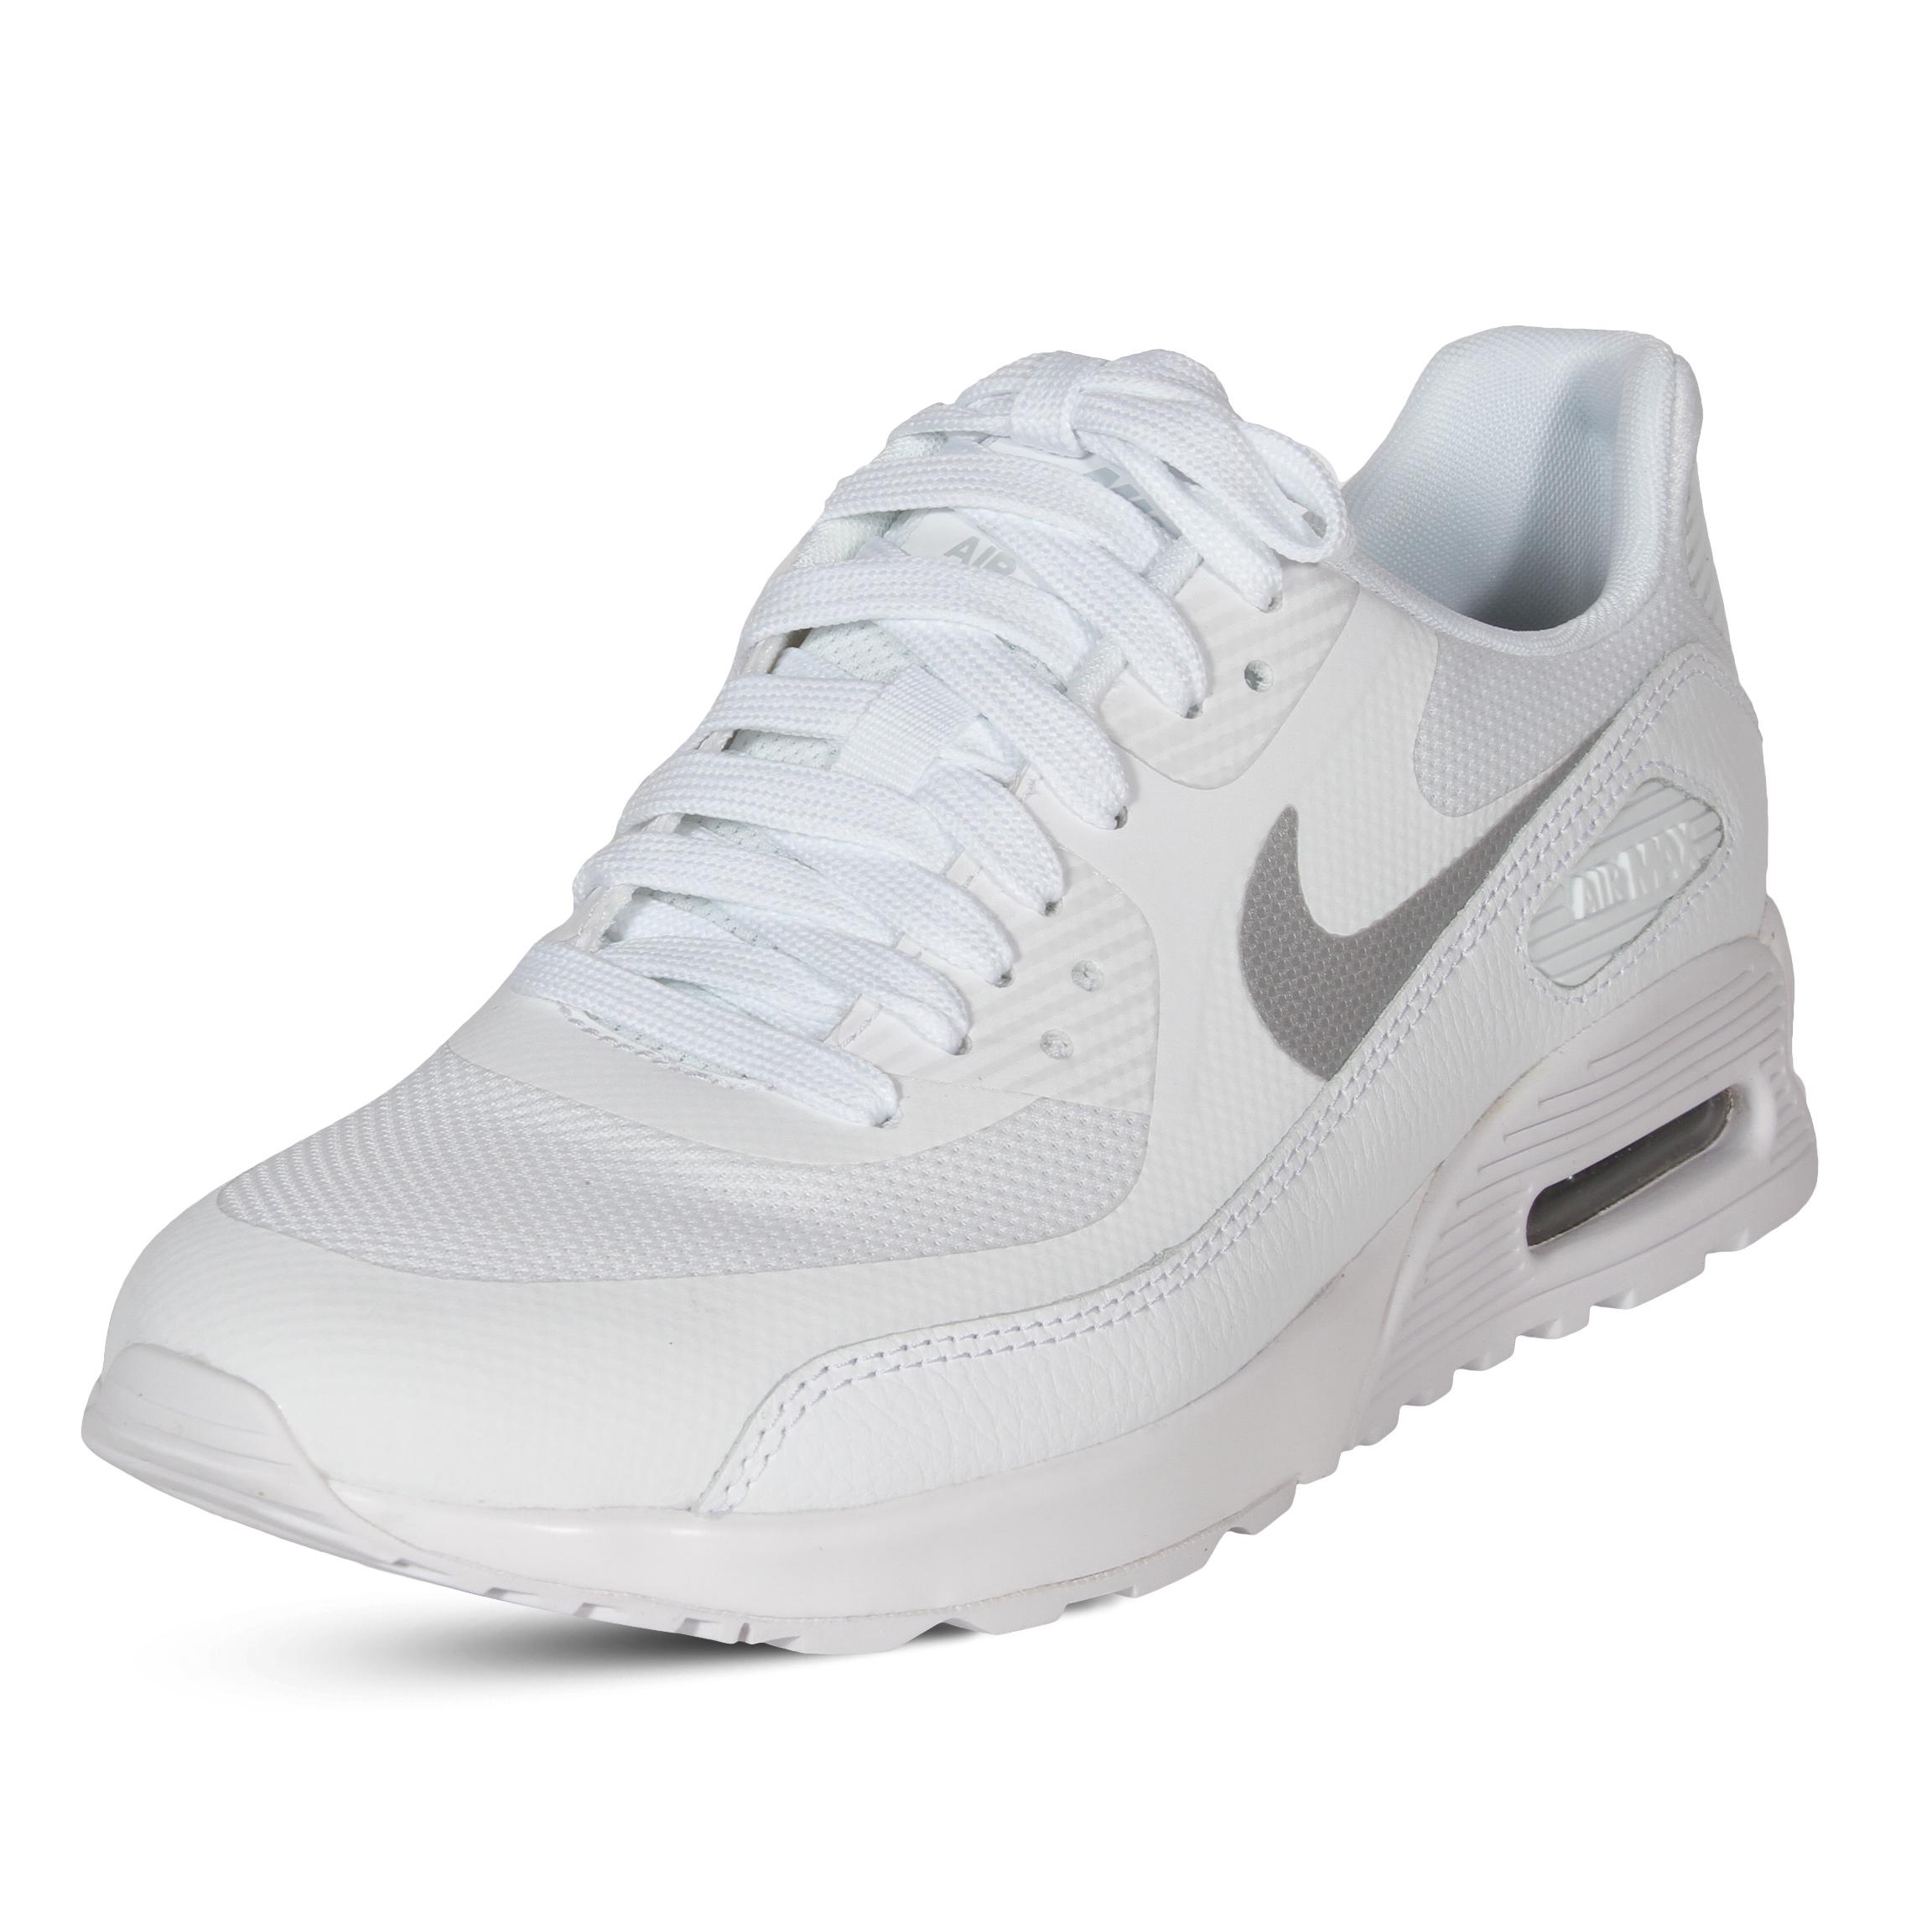 Air Max 90 Ultra 2,0 881106-101 Nike Runner